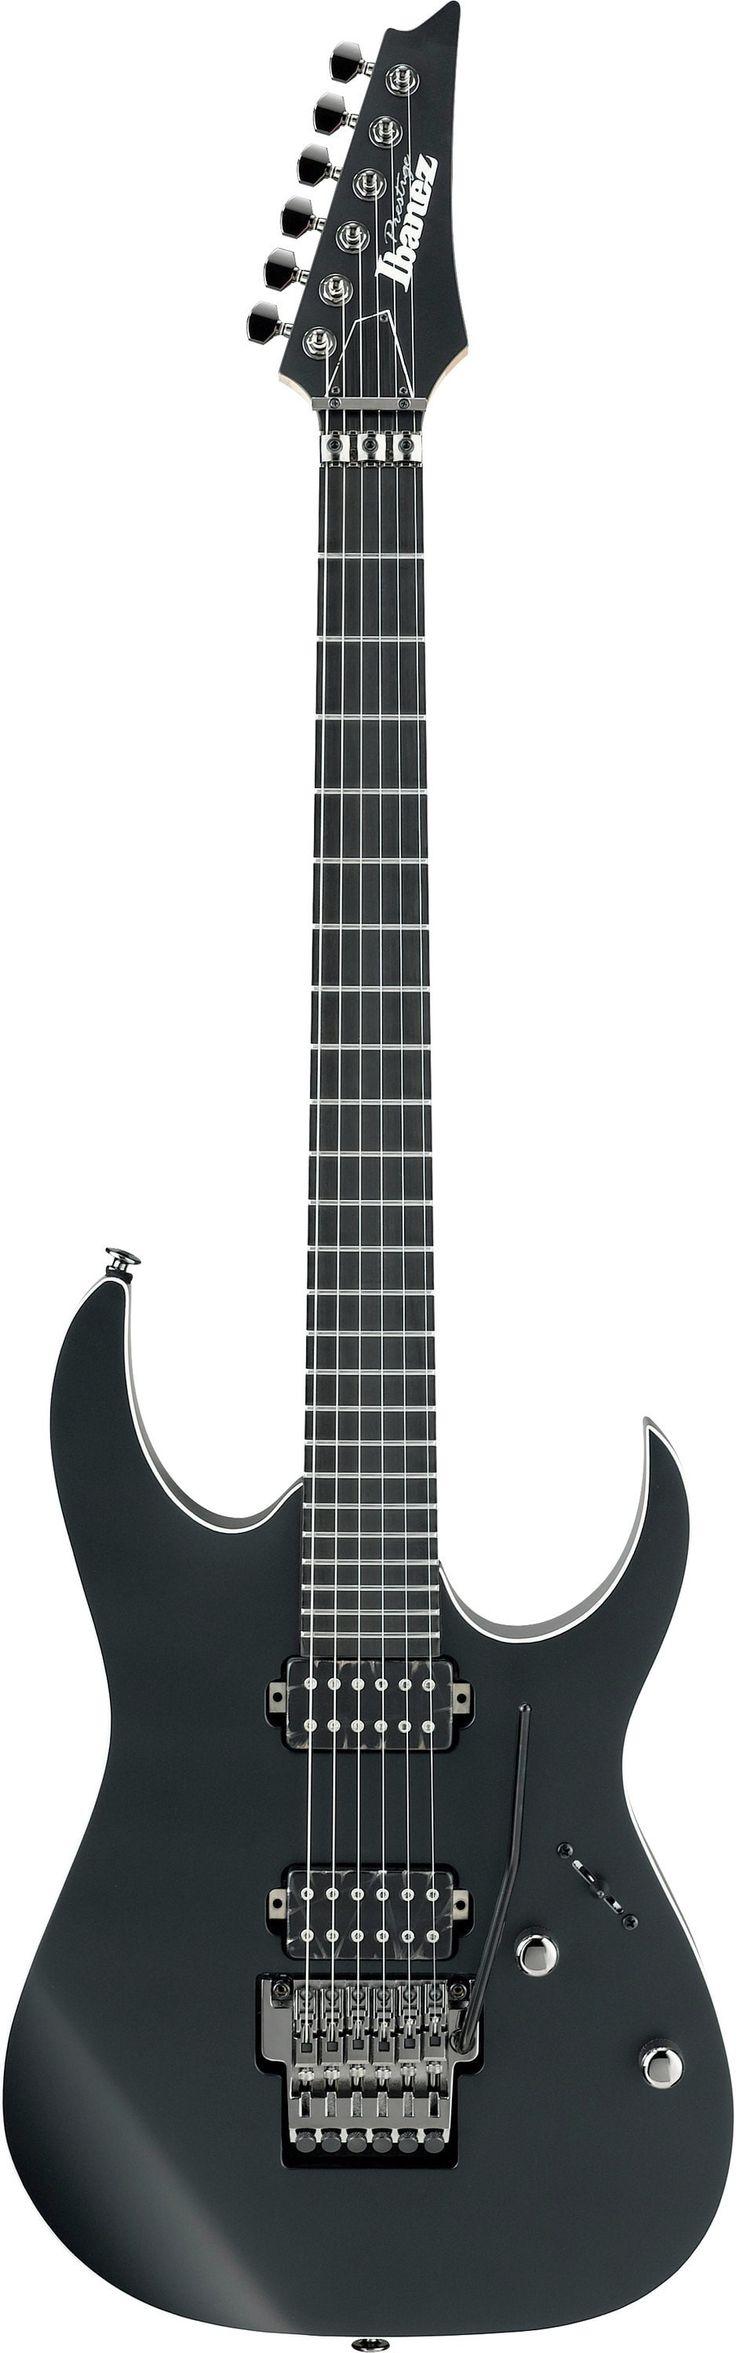 Ibanez RG6UCS Uppercut Prestige Electric Guitar